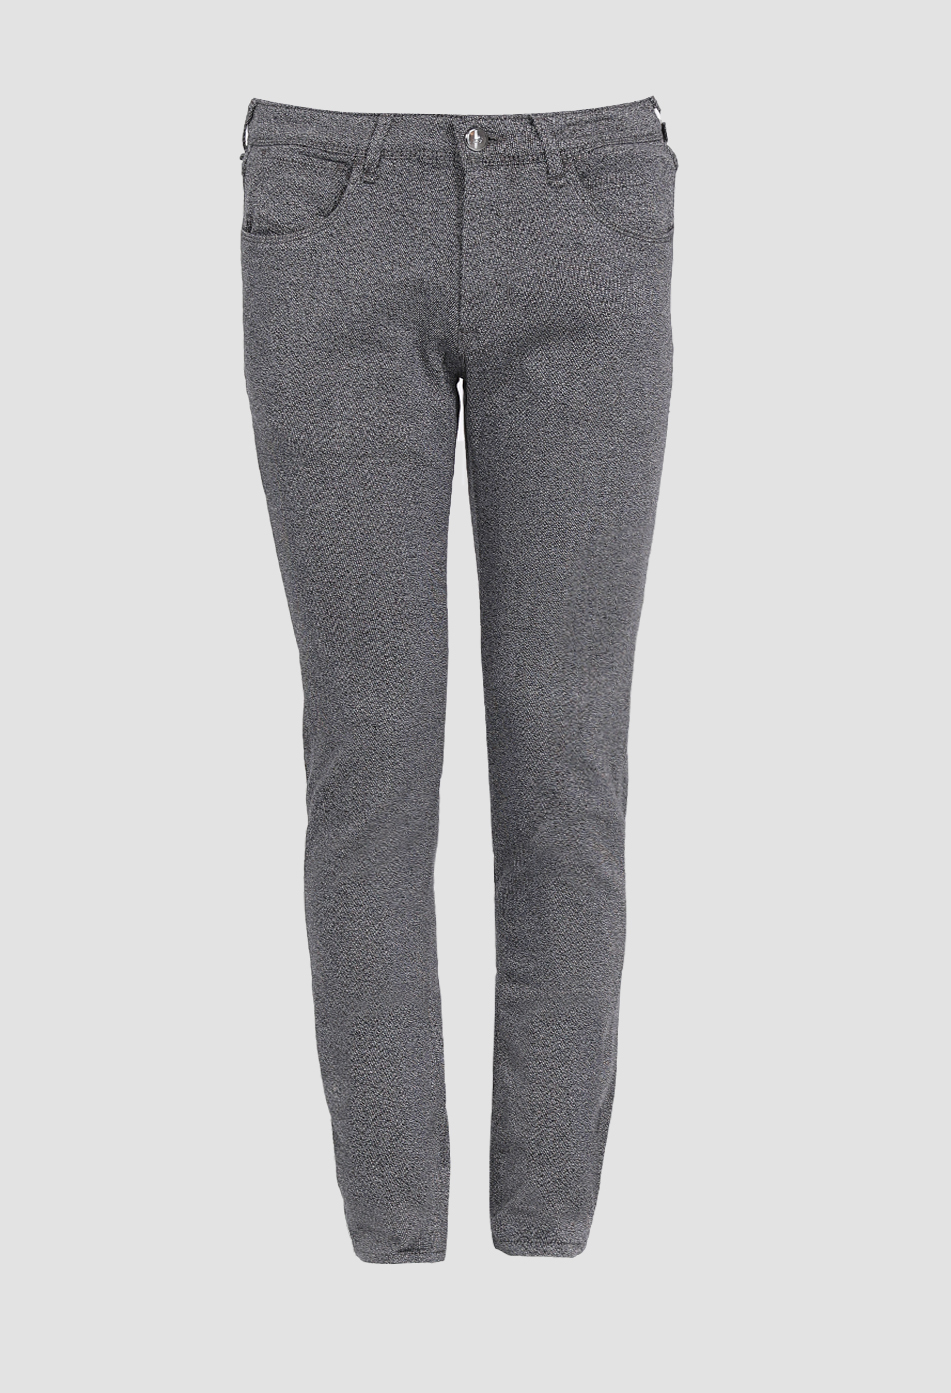 Bueno Spor 5 Cep Pantolon Slim Fit Antrasit